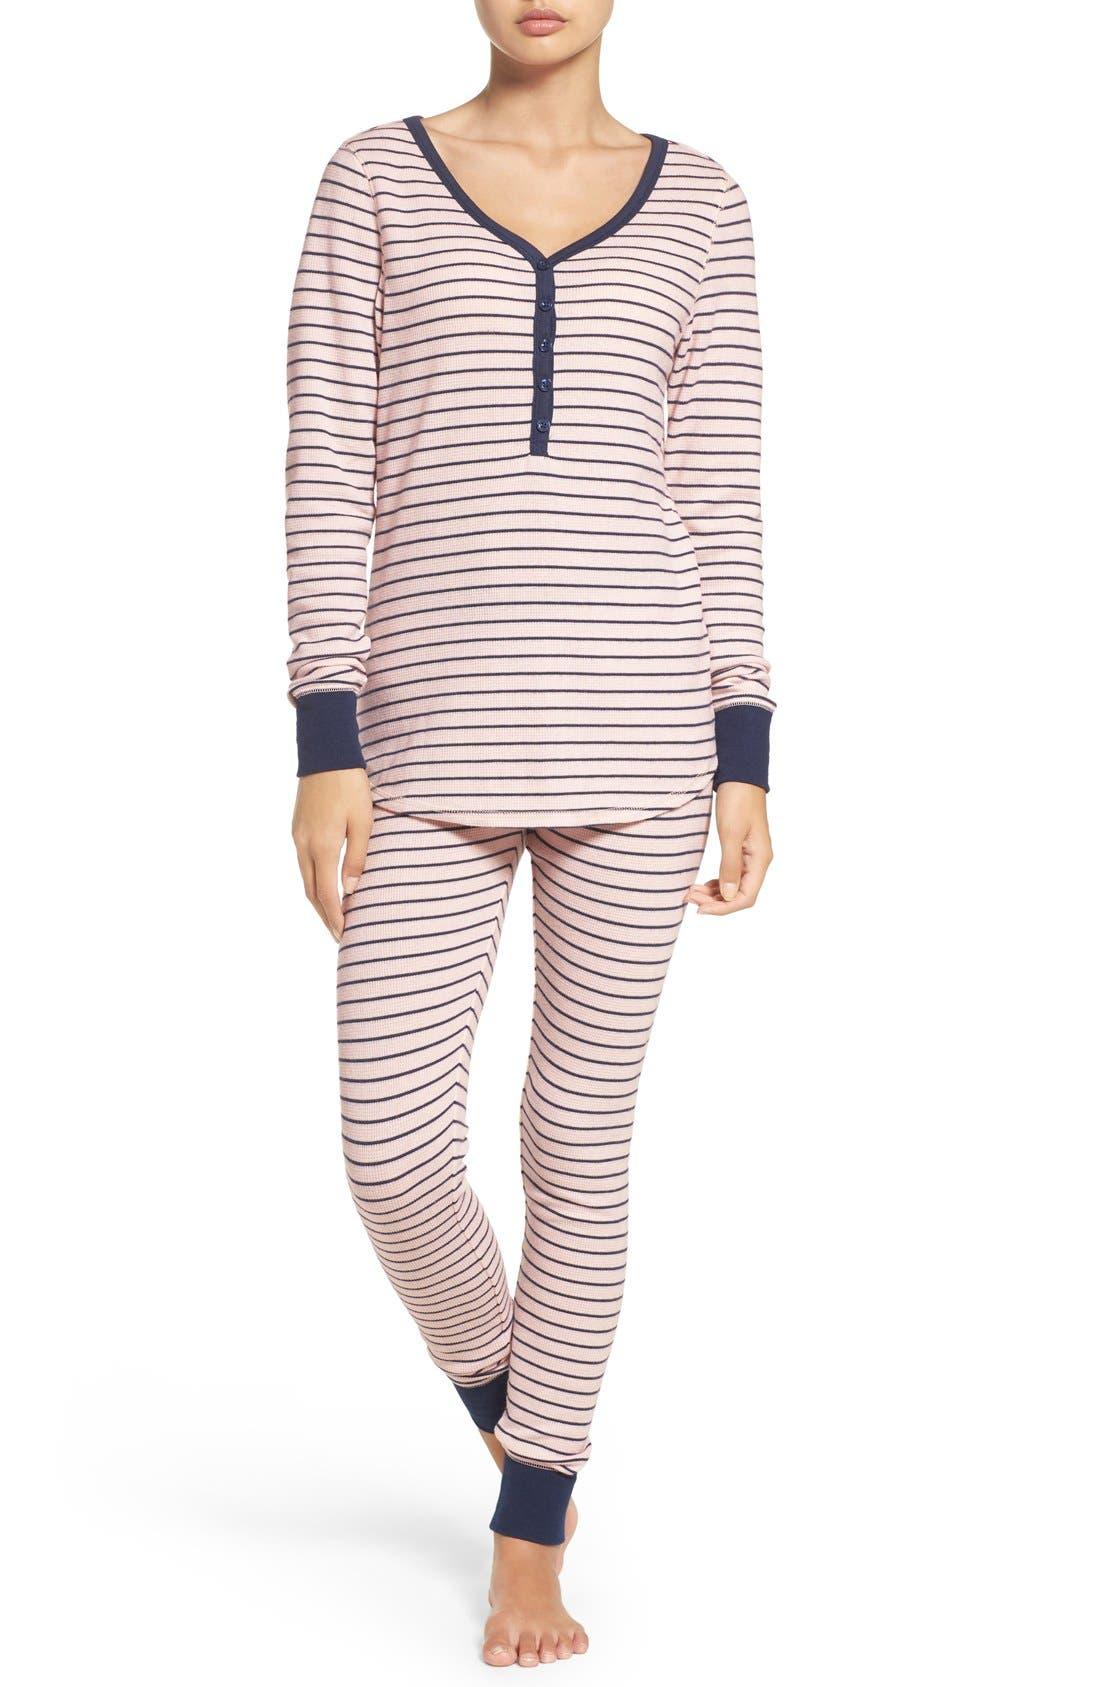 Main Image - Nordstrom Lingerie Sleepyhead Thermal Pajamas